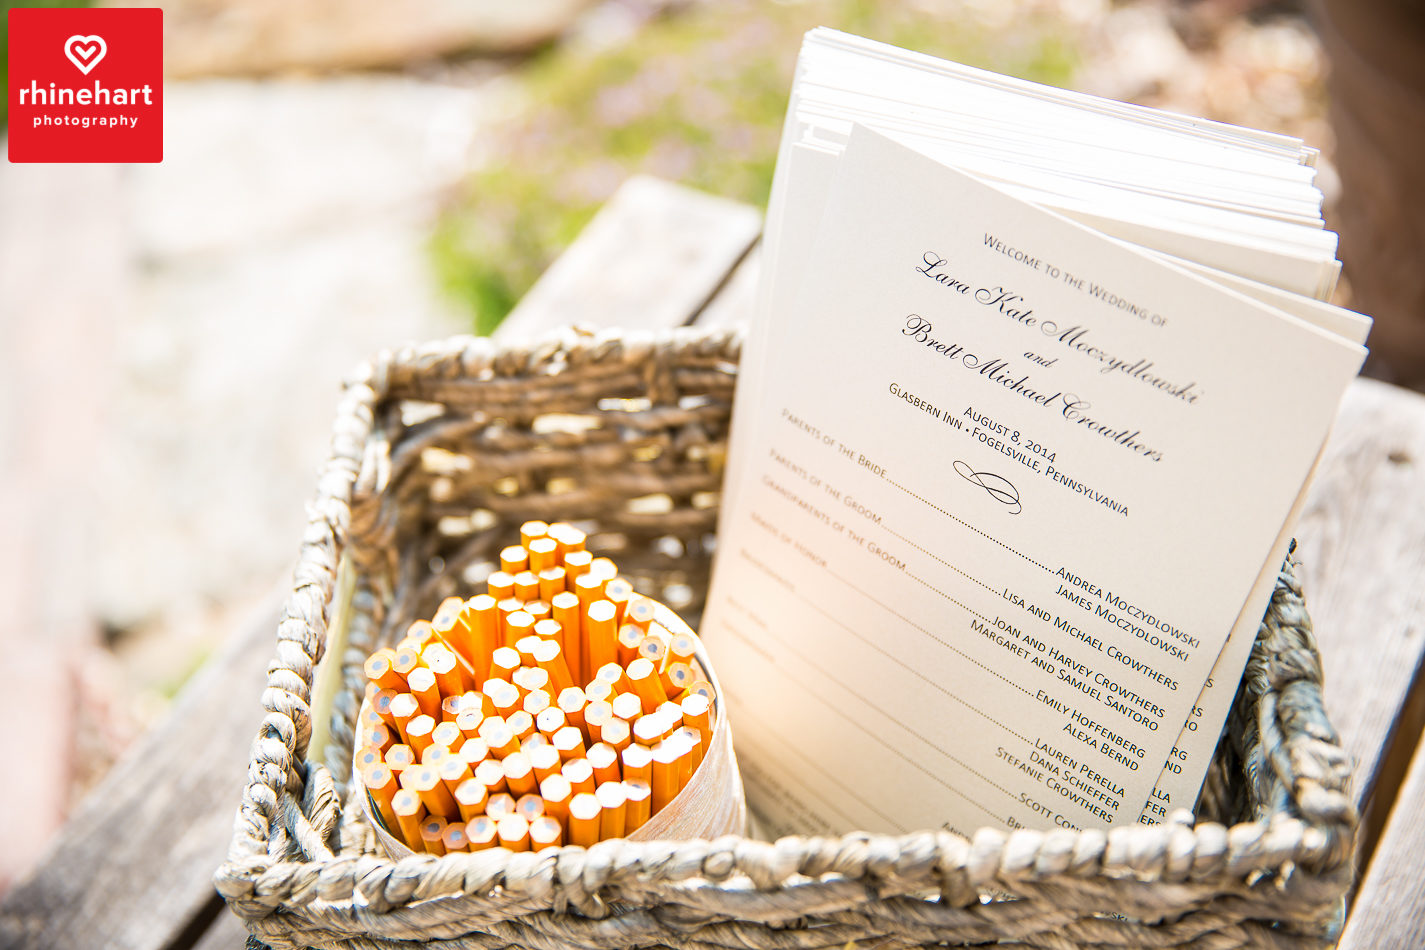 glasbern-inn-wedding-photographer-220